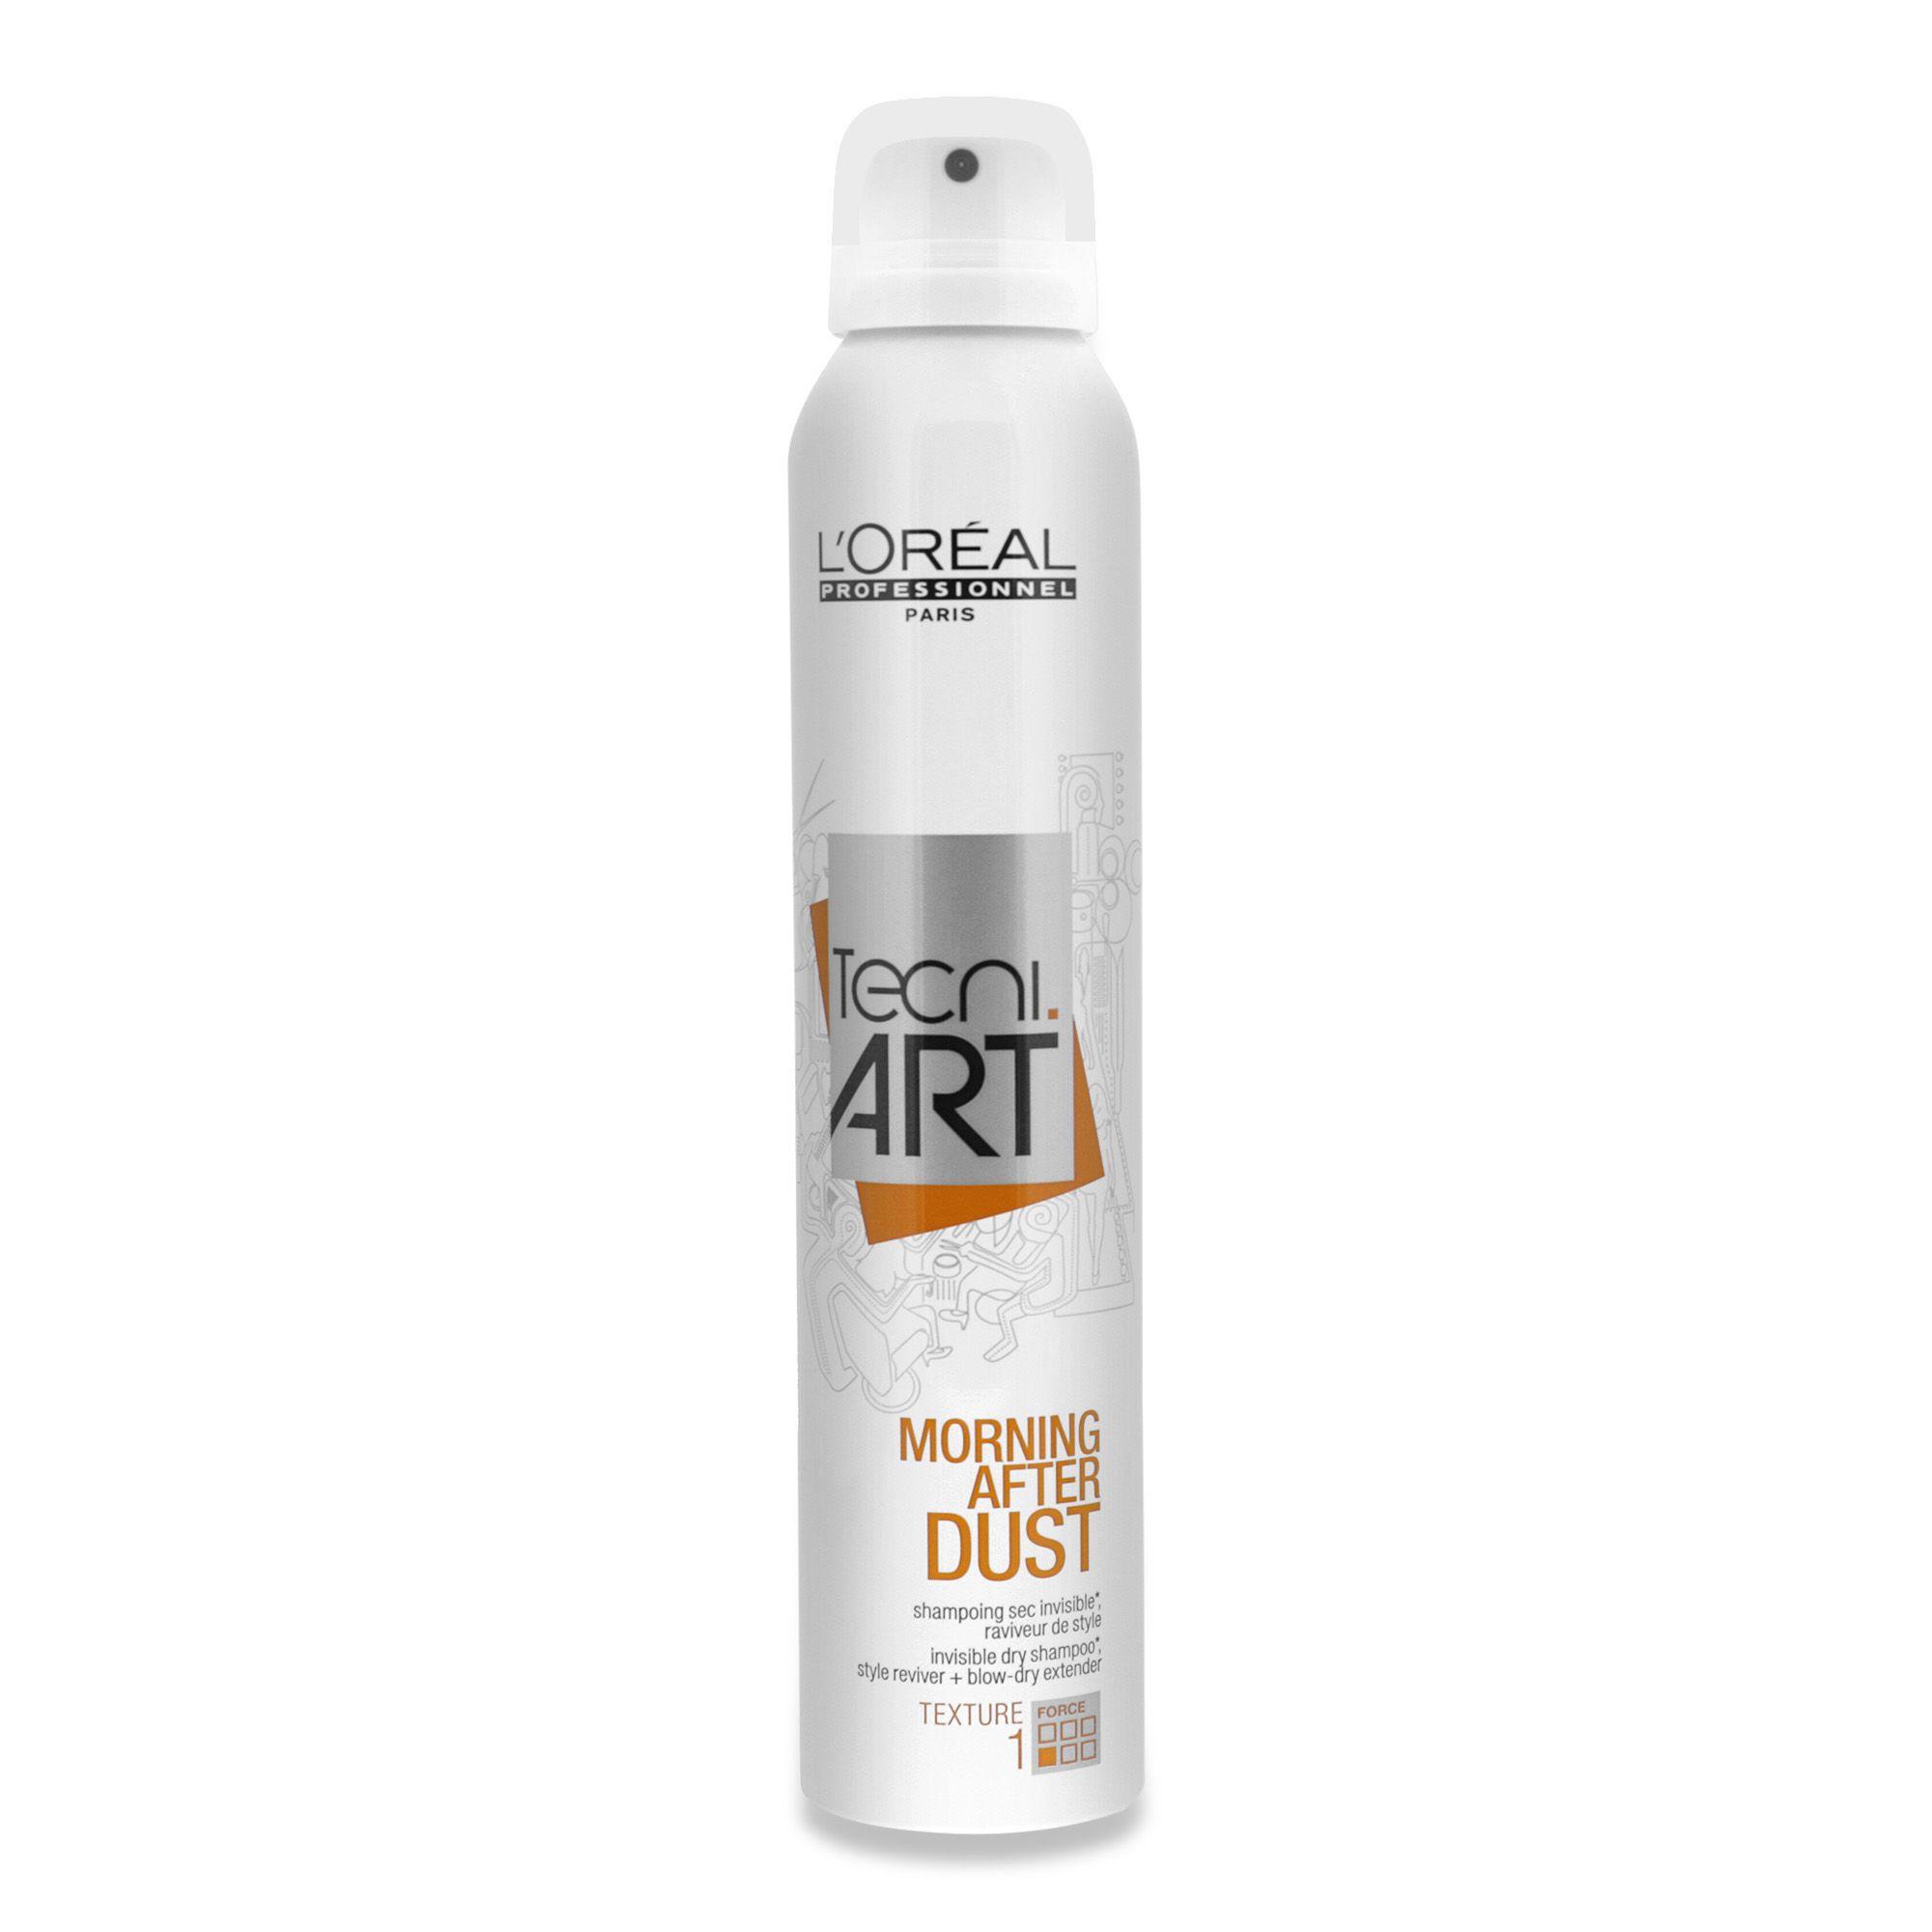 L Oreal Professionnel Tecni Art Morning After Dust Dry Shampoo Dry Shampoo Shampoo Oily Scalp